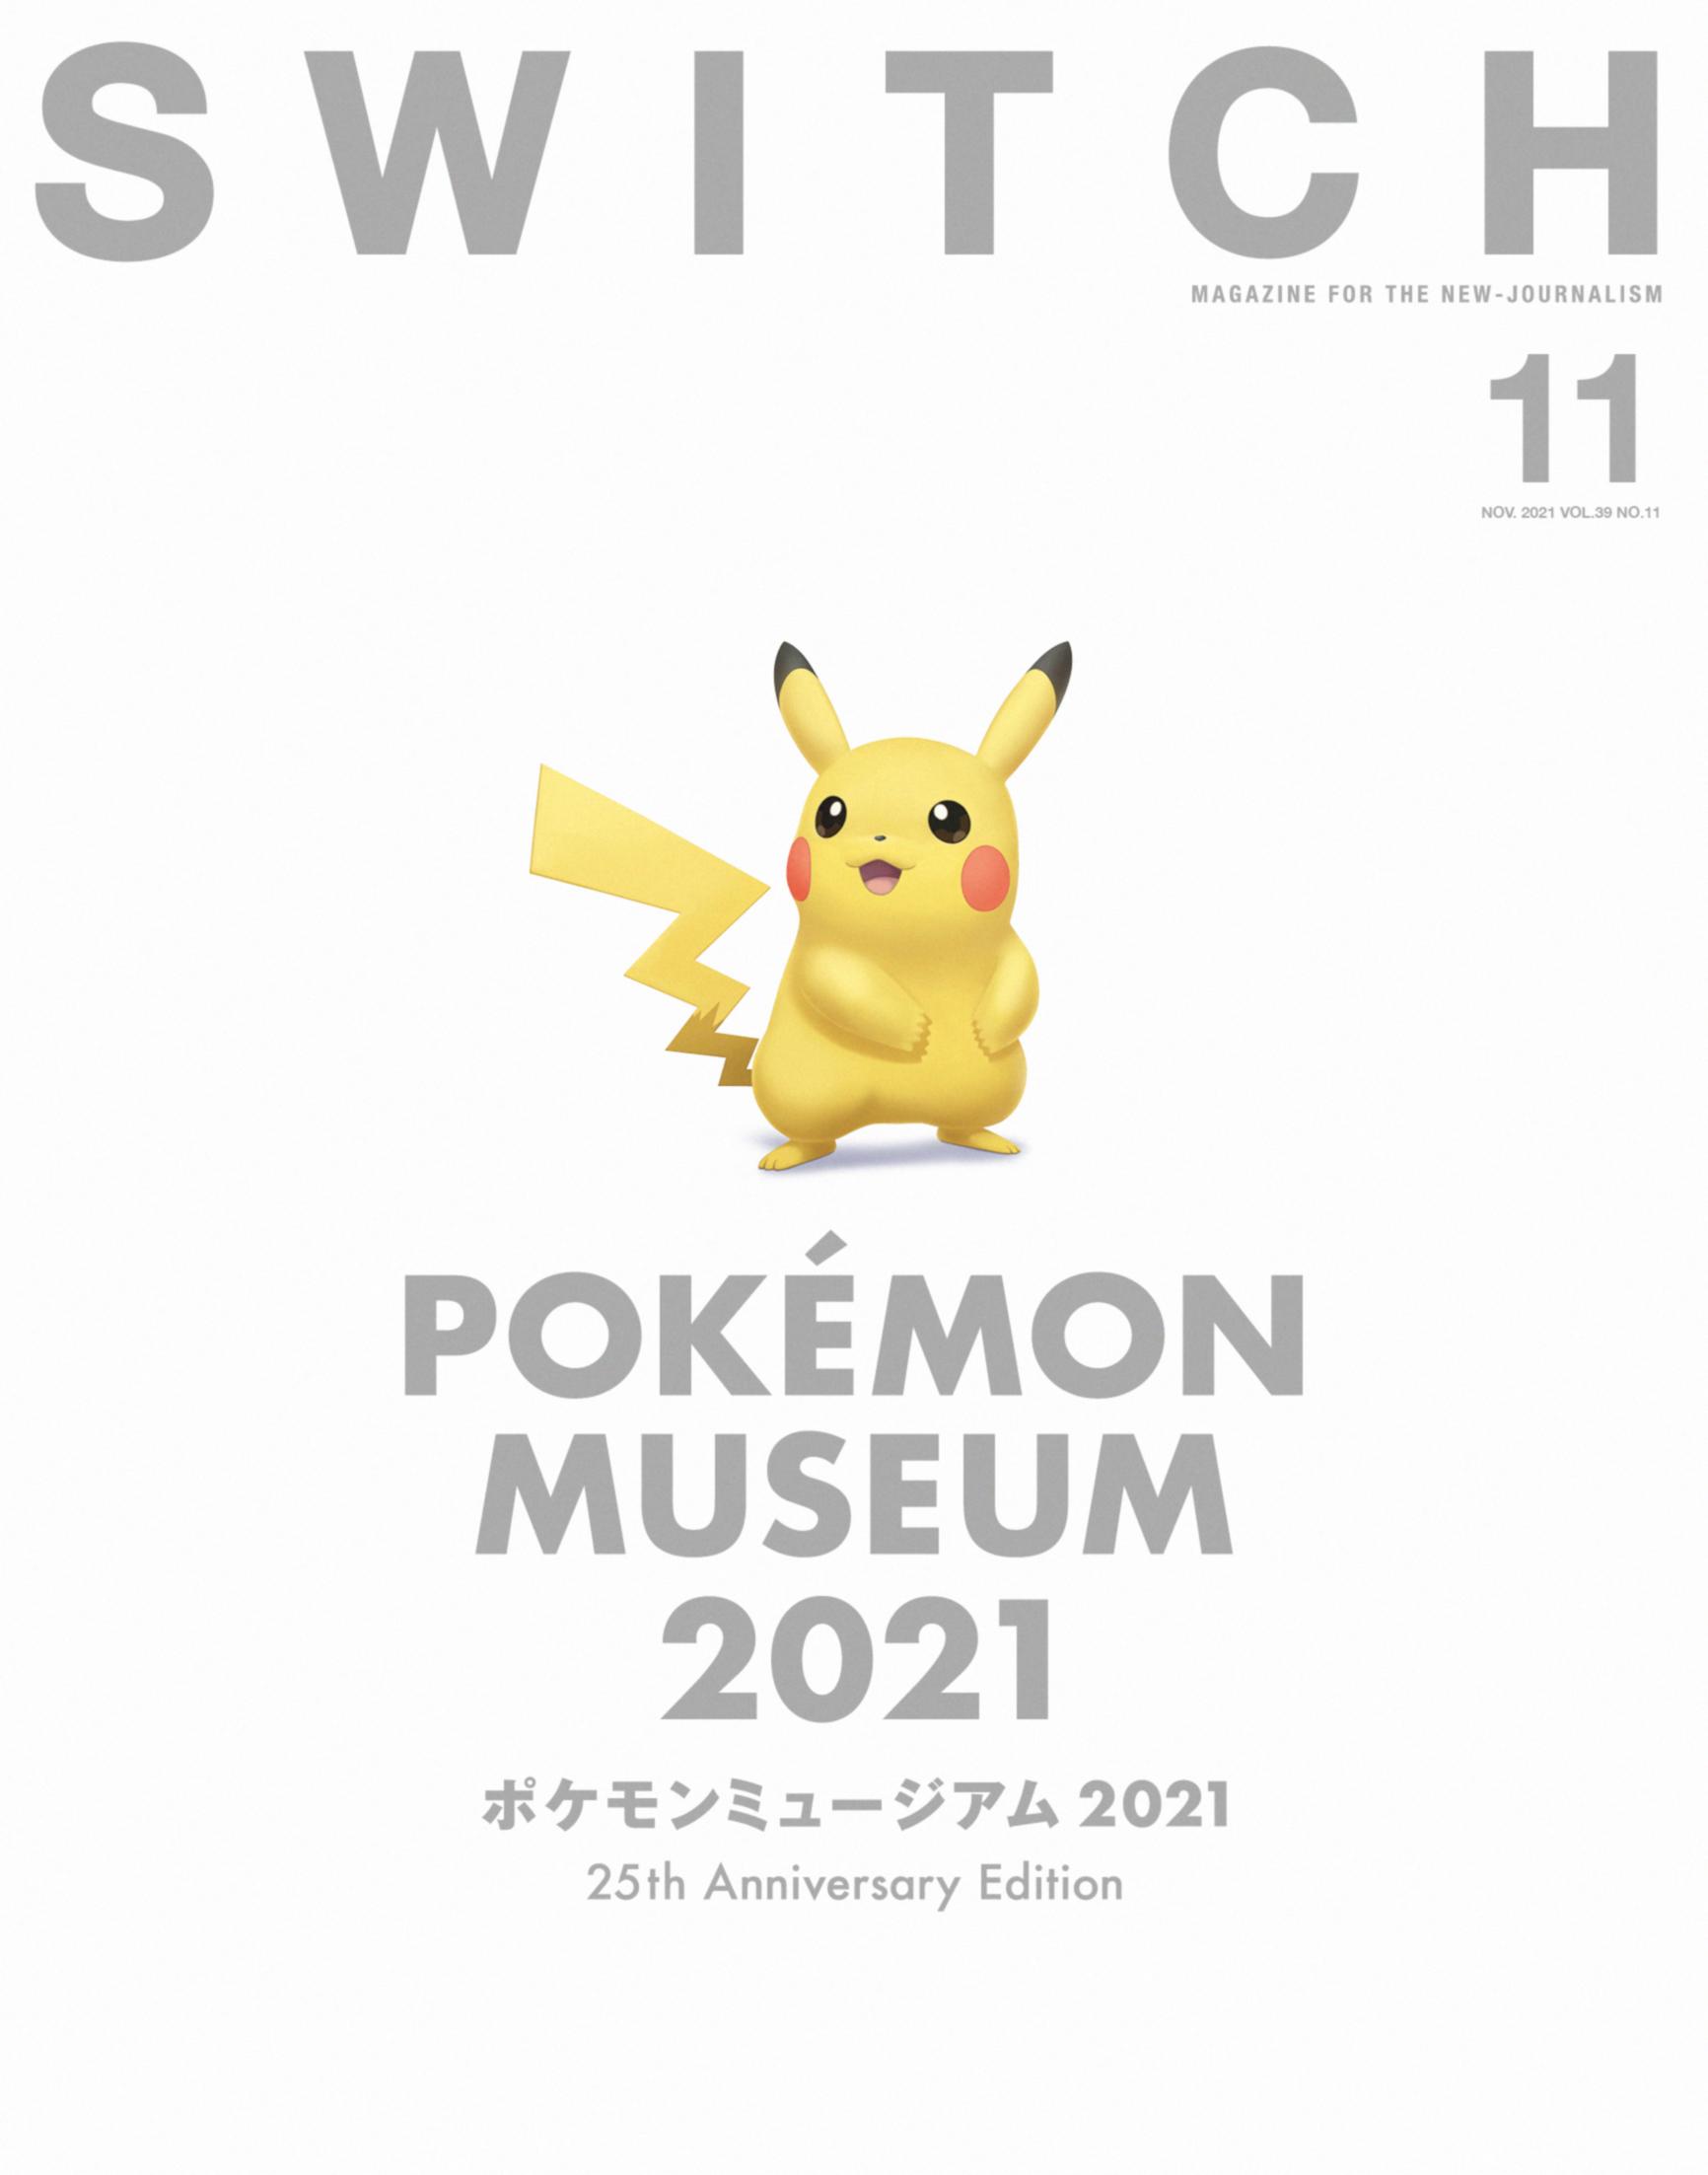 SWITCH Vol.39 No.11 特集 ポケモンミュージアム2021